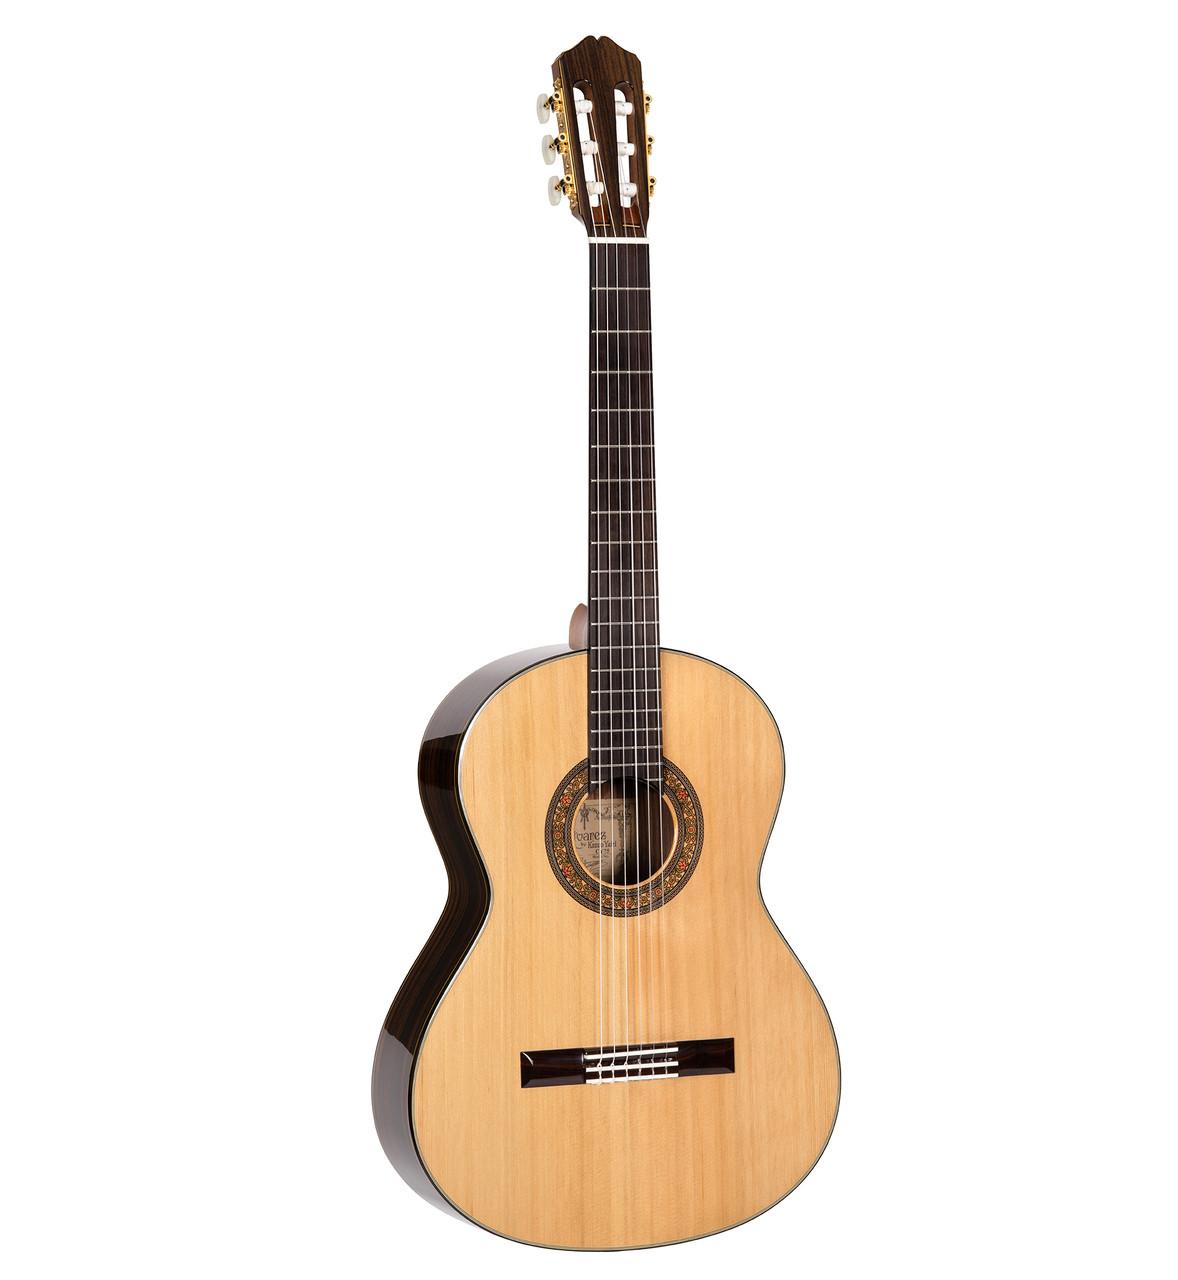 Alvarez Yairi CY75 Standard Concert Classical Cedar/Rosewood